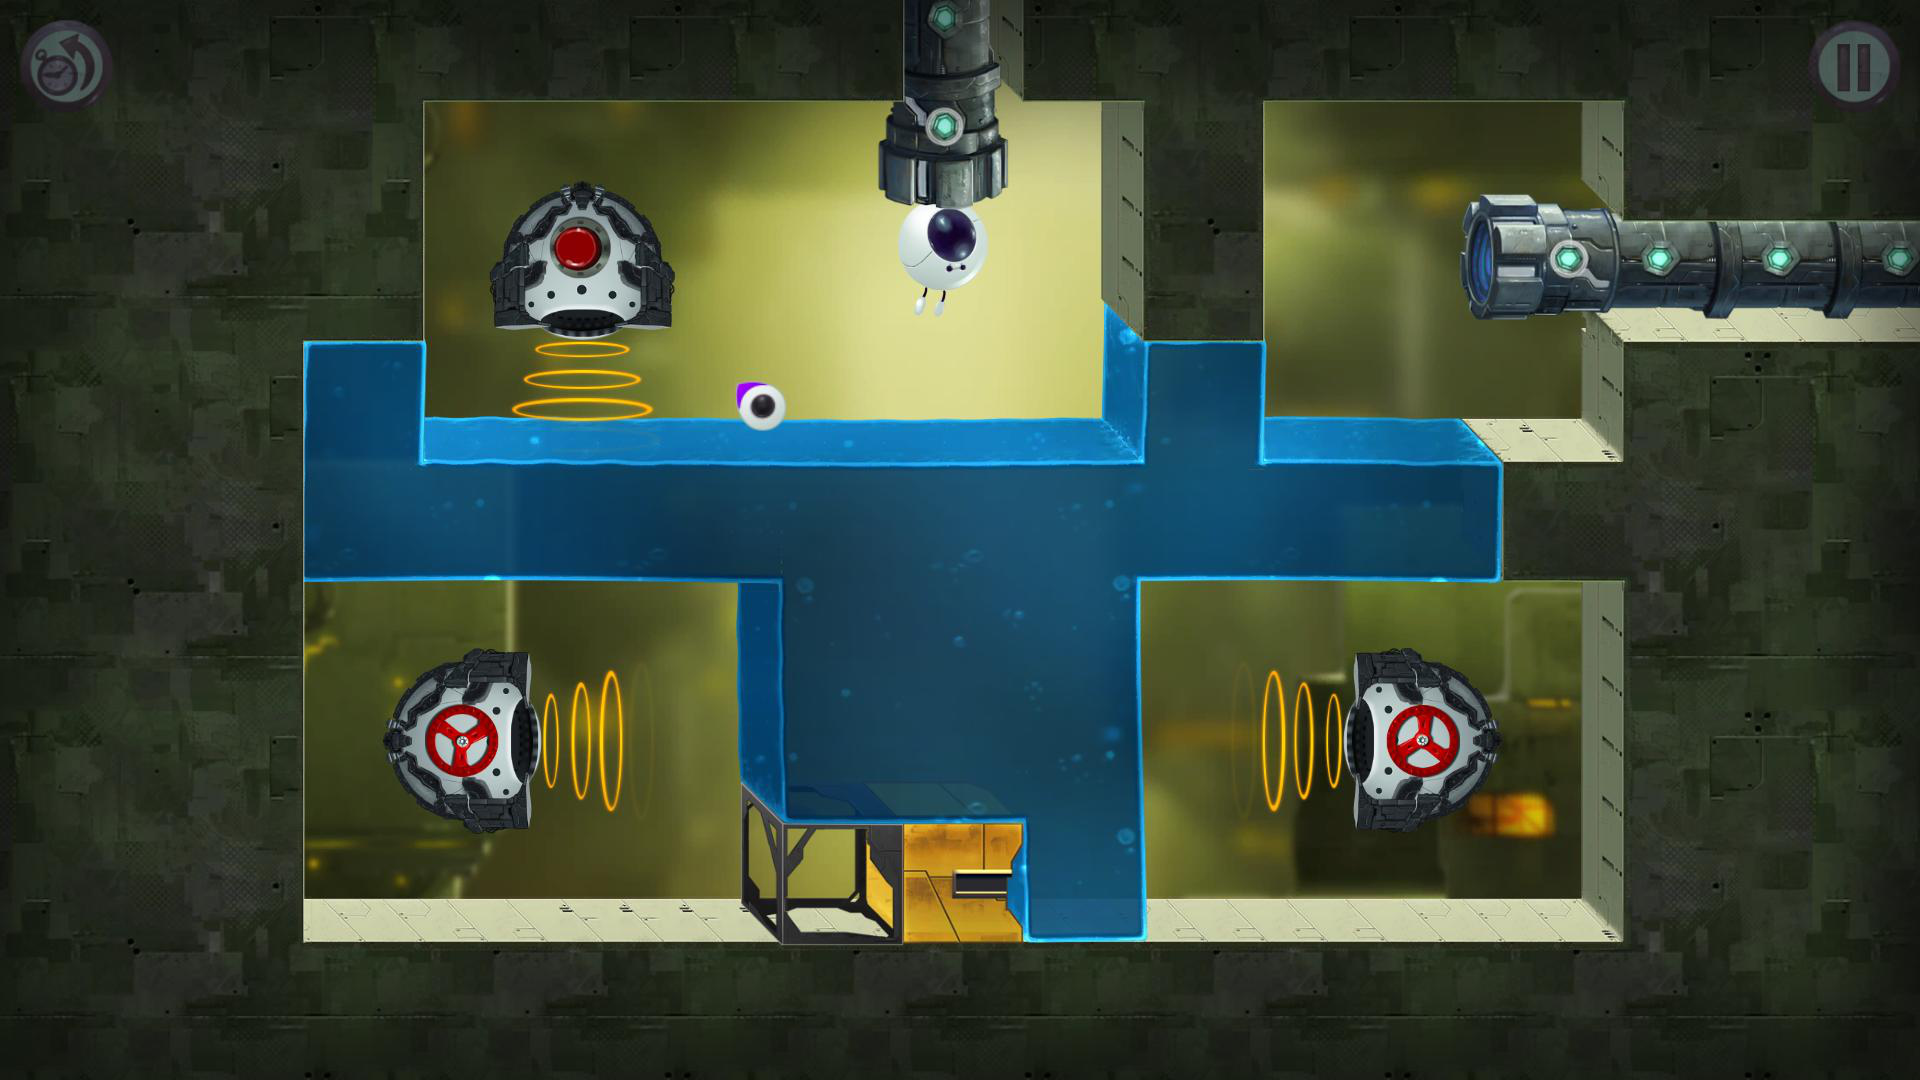 tetrobot-and-co-screenshot-ME3050191027_2